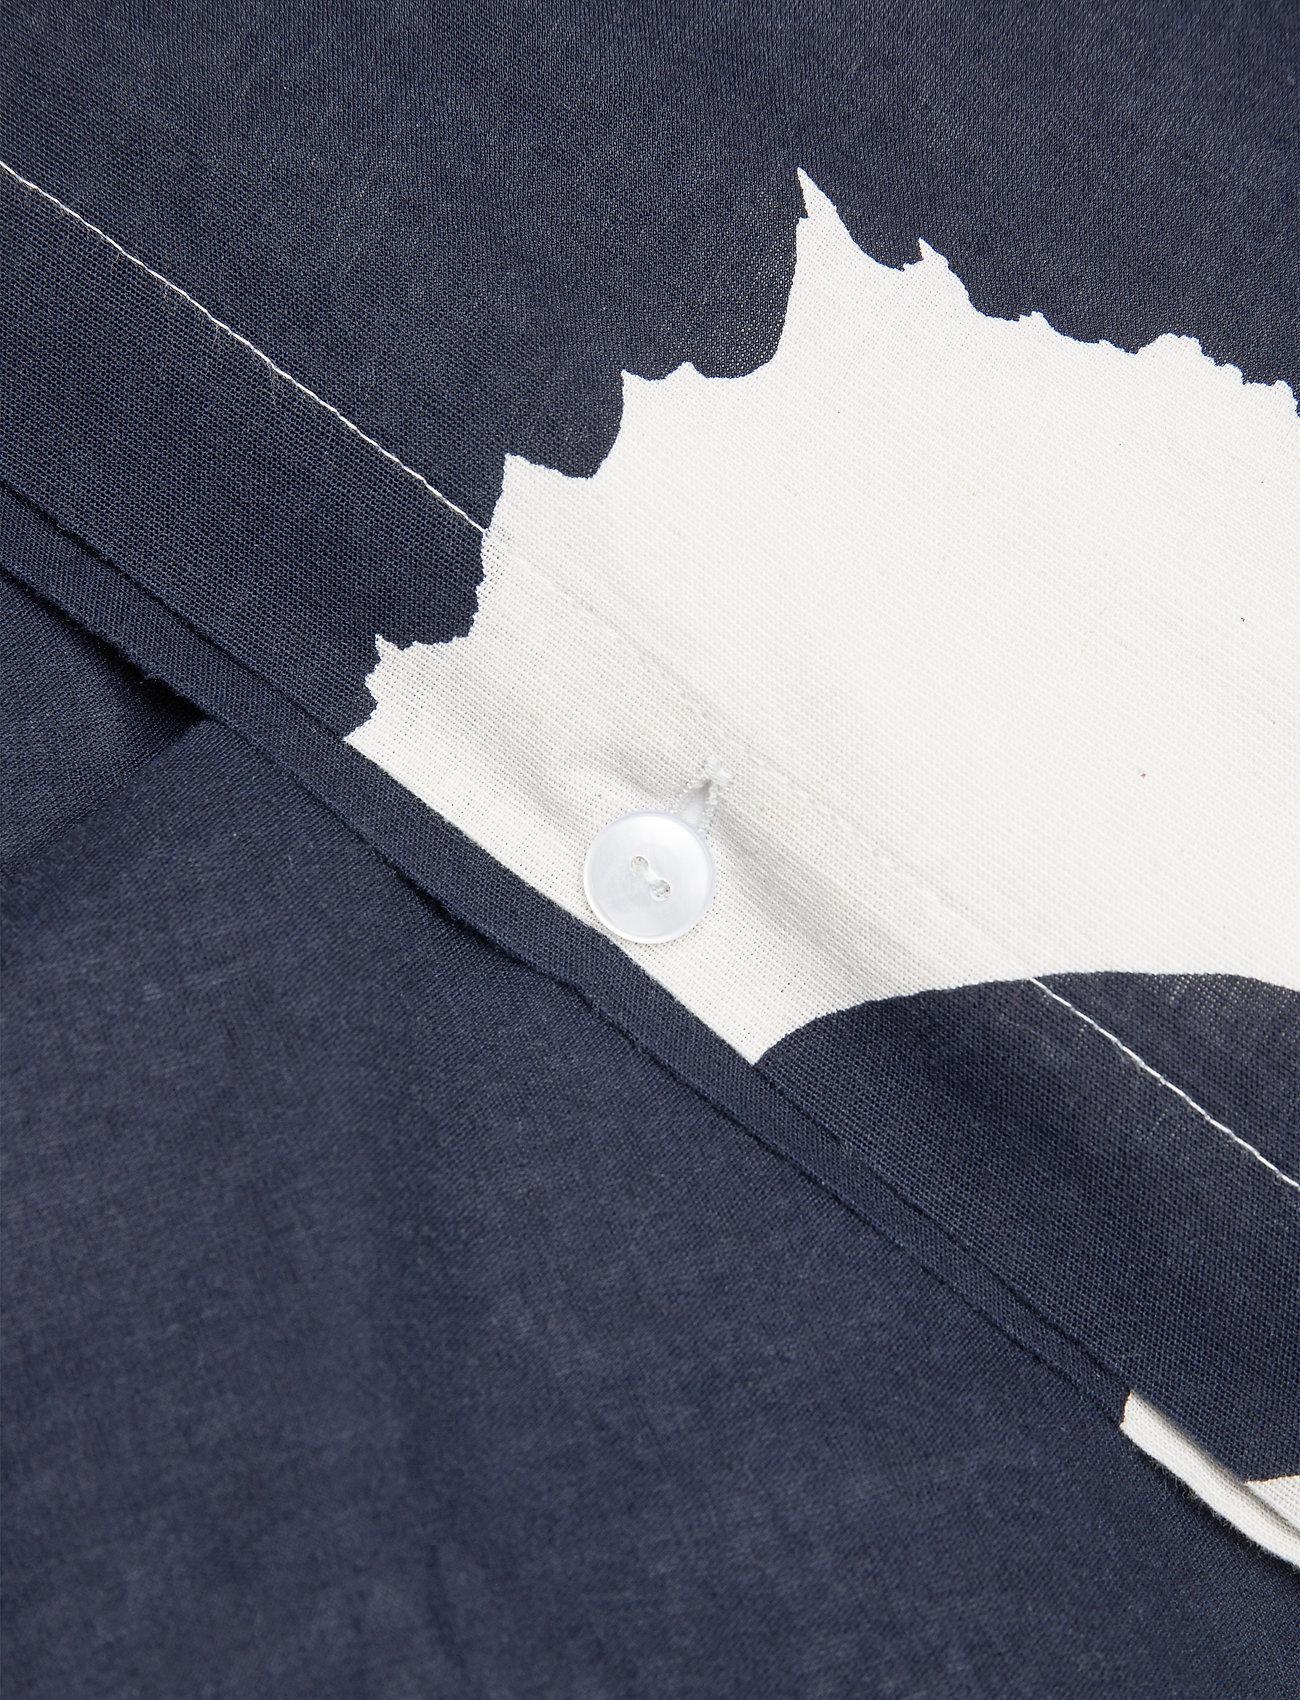 Marimekko Home - UNIKKO CO/LI DC - poszwa na kołdrę - cotton, dark blue - 1